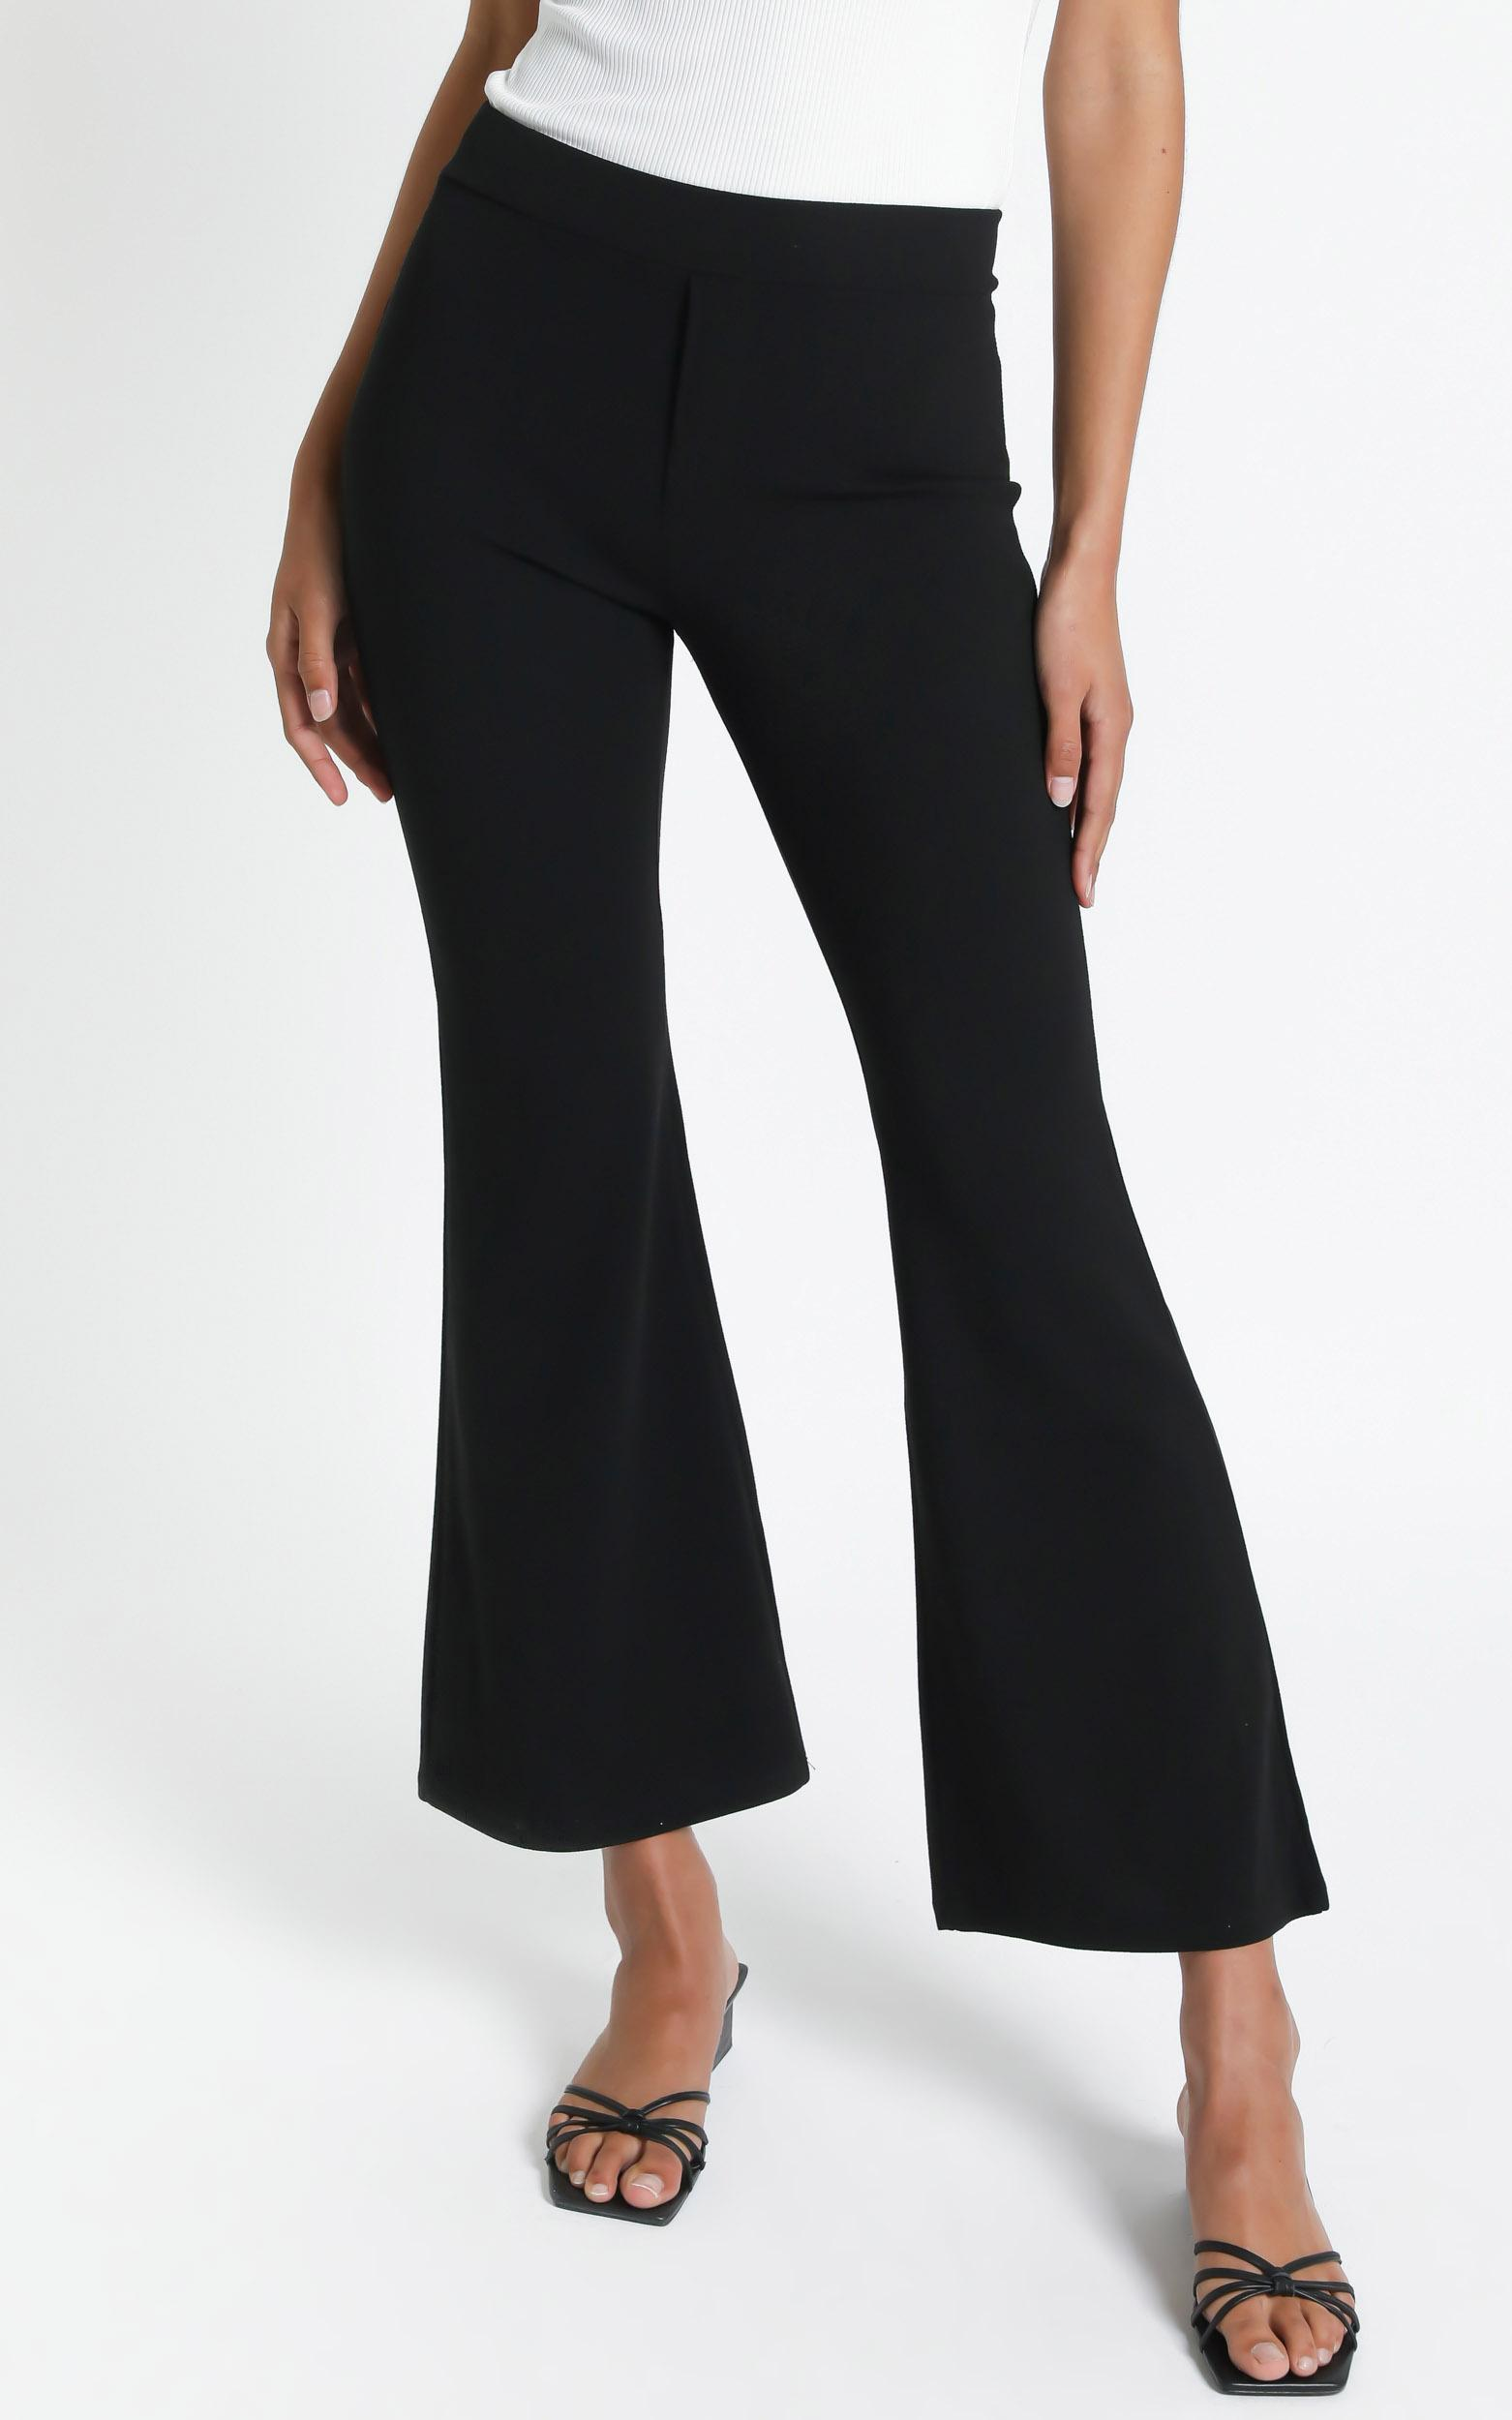 Connor Flared Pants in Black - S, Black, hi-res image number null